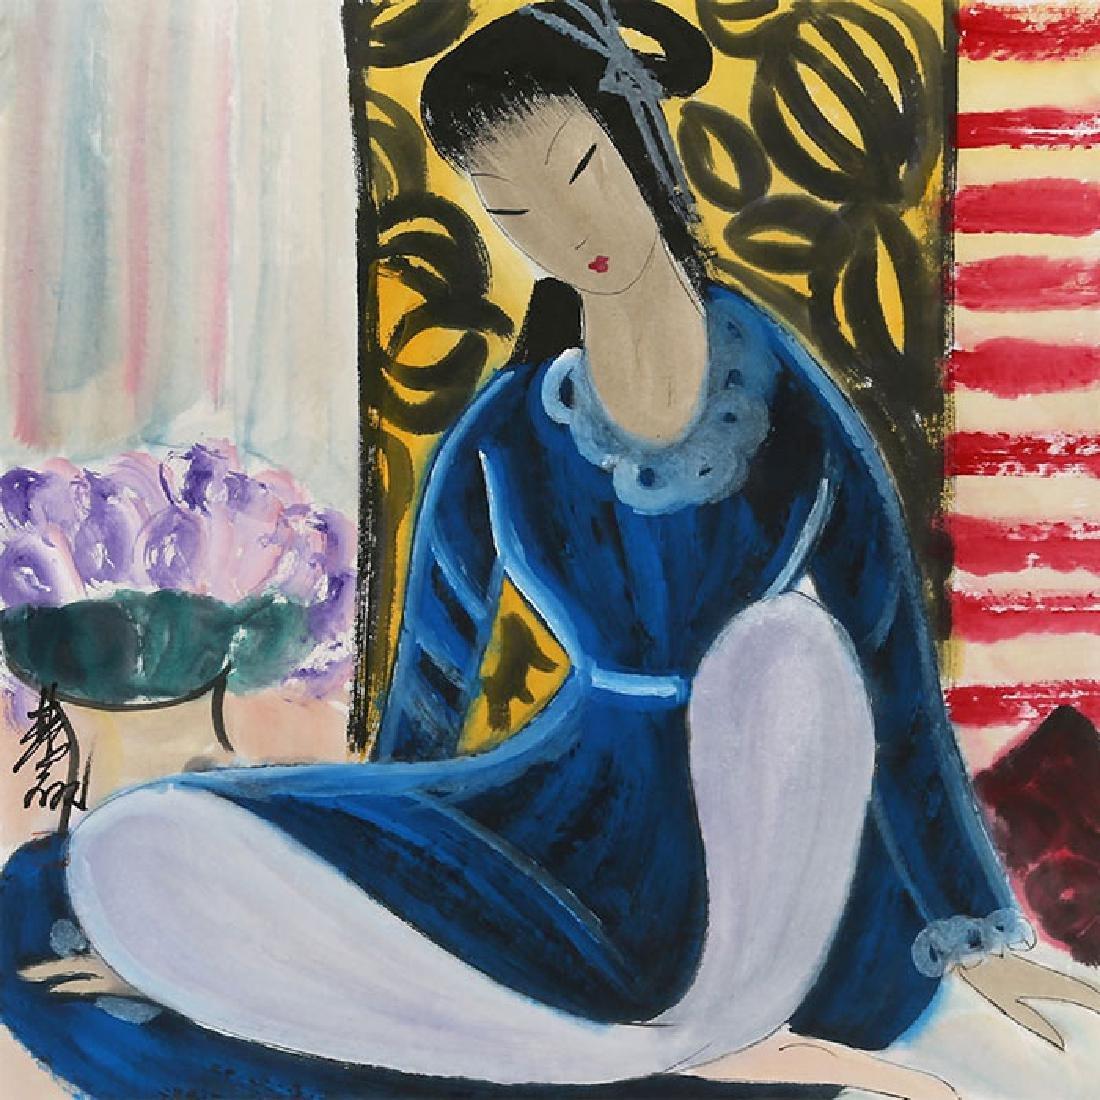 Lin Fengmian (1900-1991), Figures